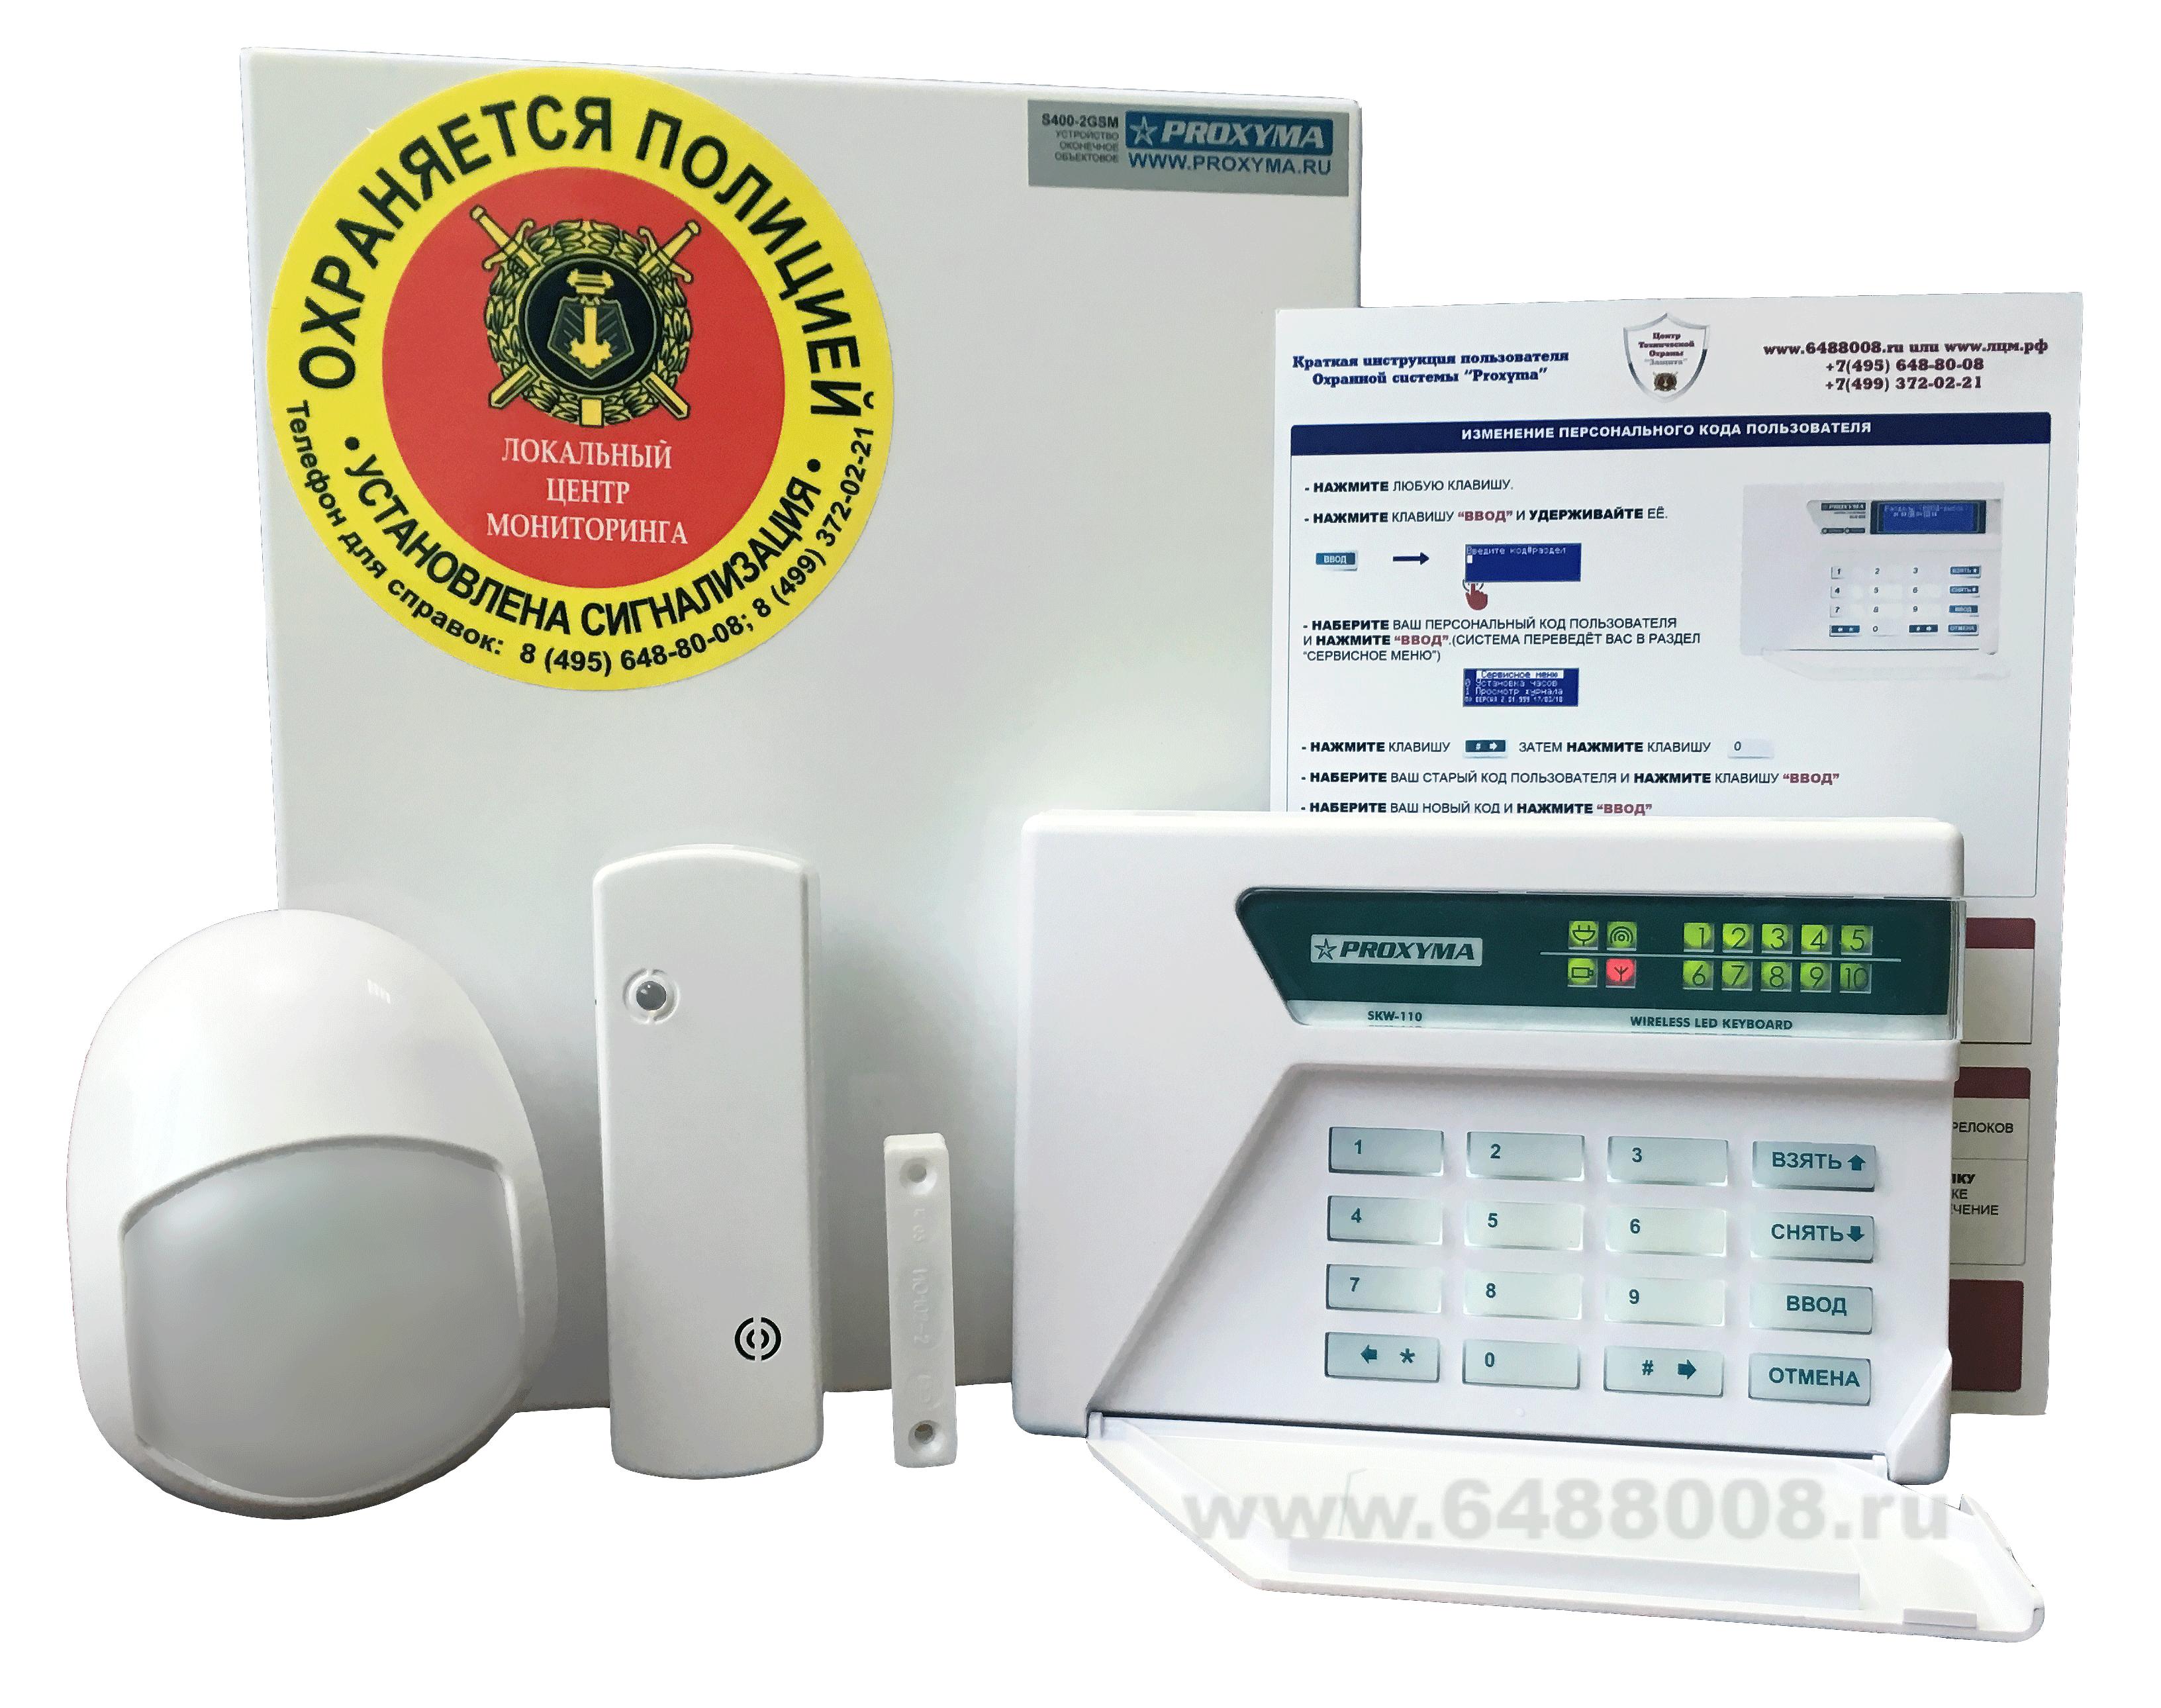 Автономная сигнализация для дачи с сиреной на батарейках